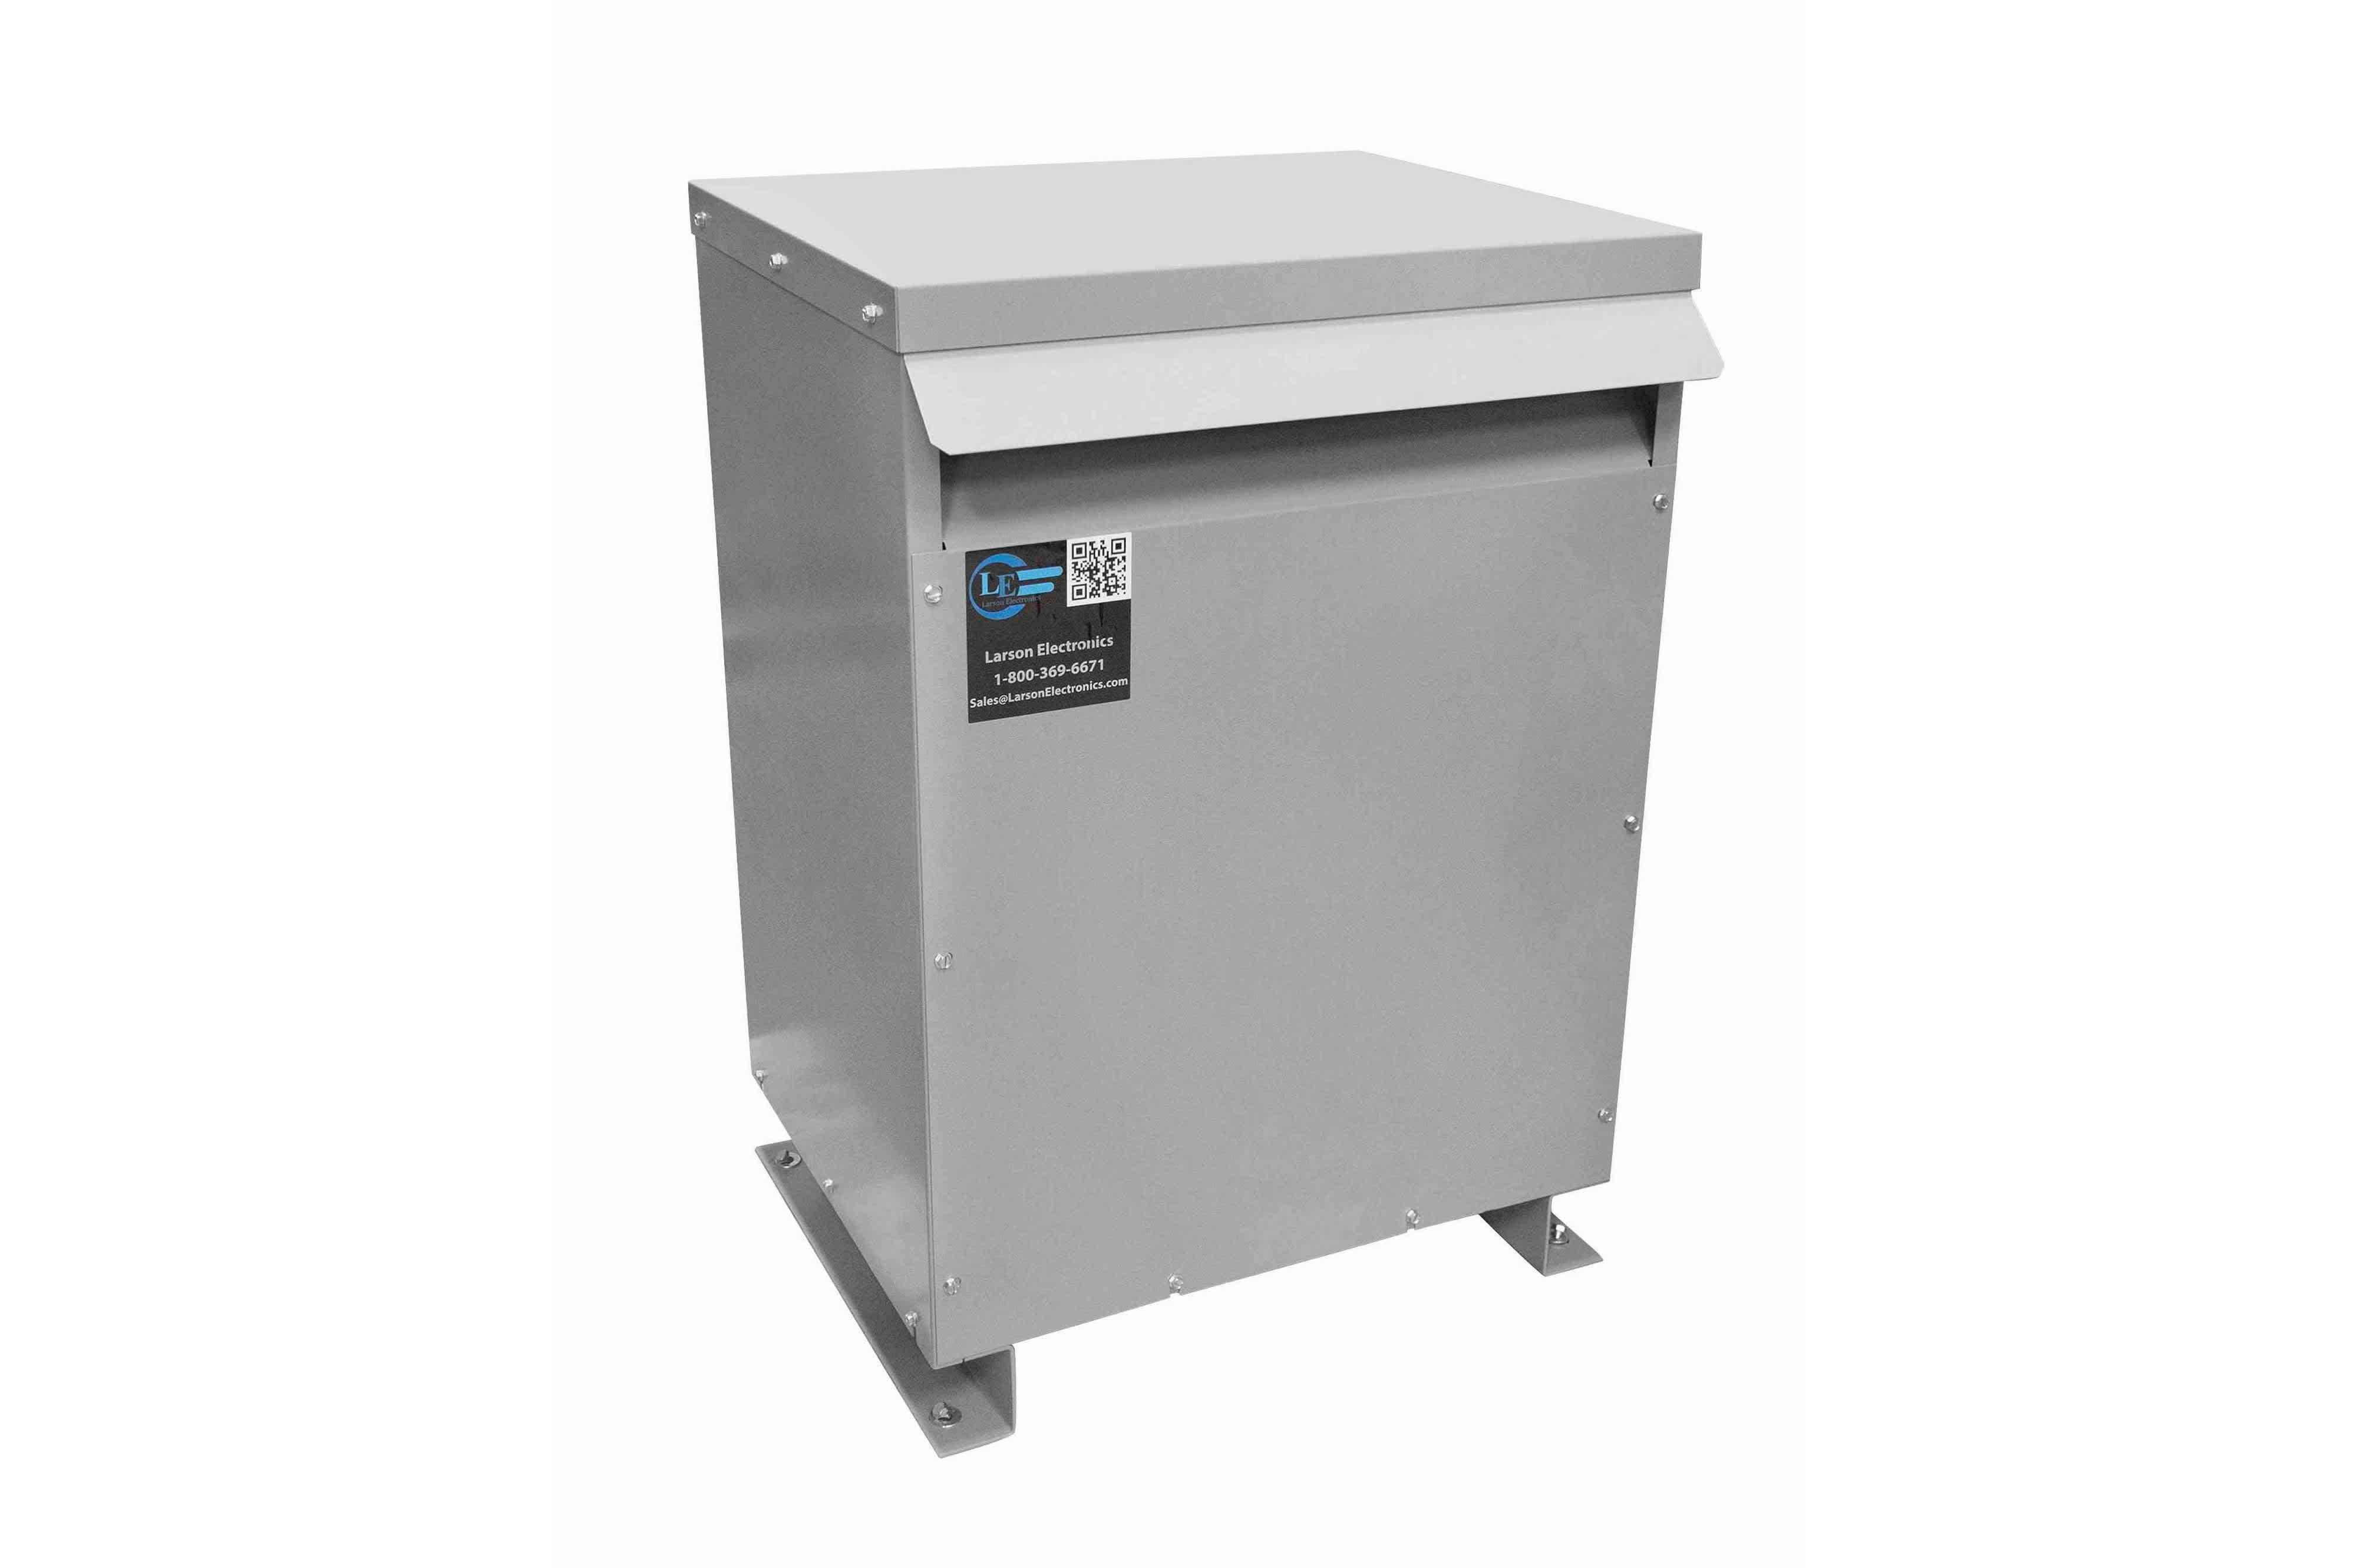 900 kVA 3PH Isolation Transformer, 600V Wye Primary, 400V Delta Secondary, N3R, Ventilated, 60 Hz